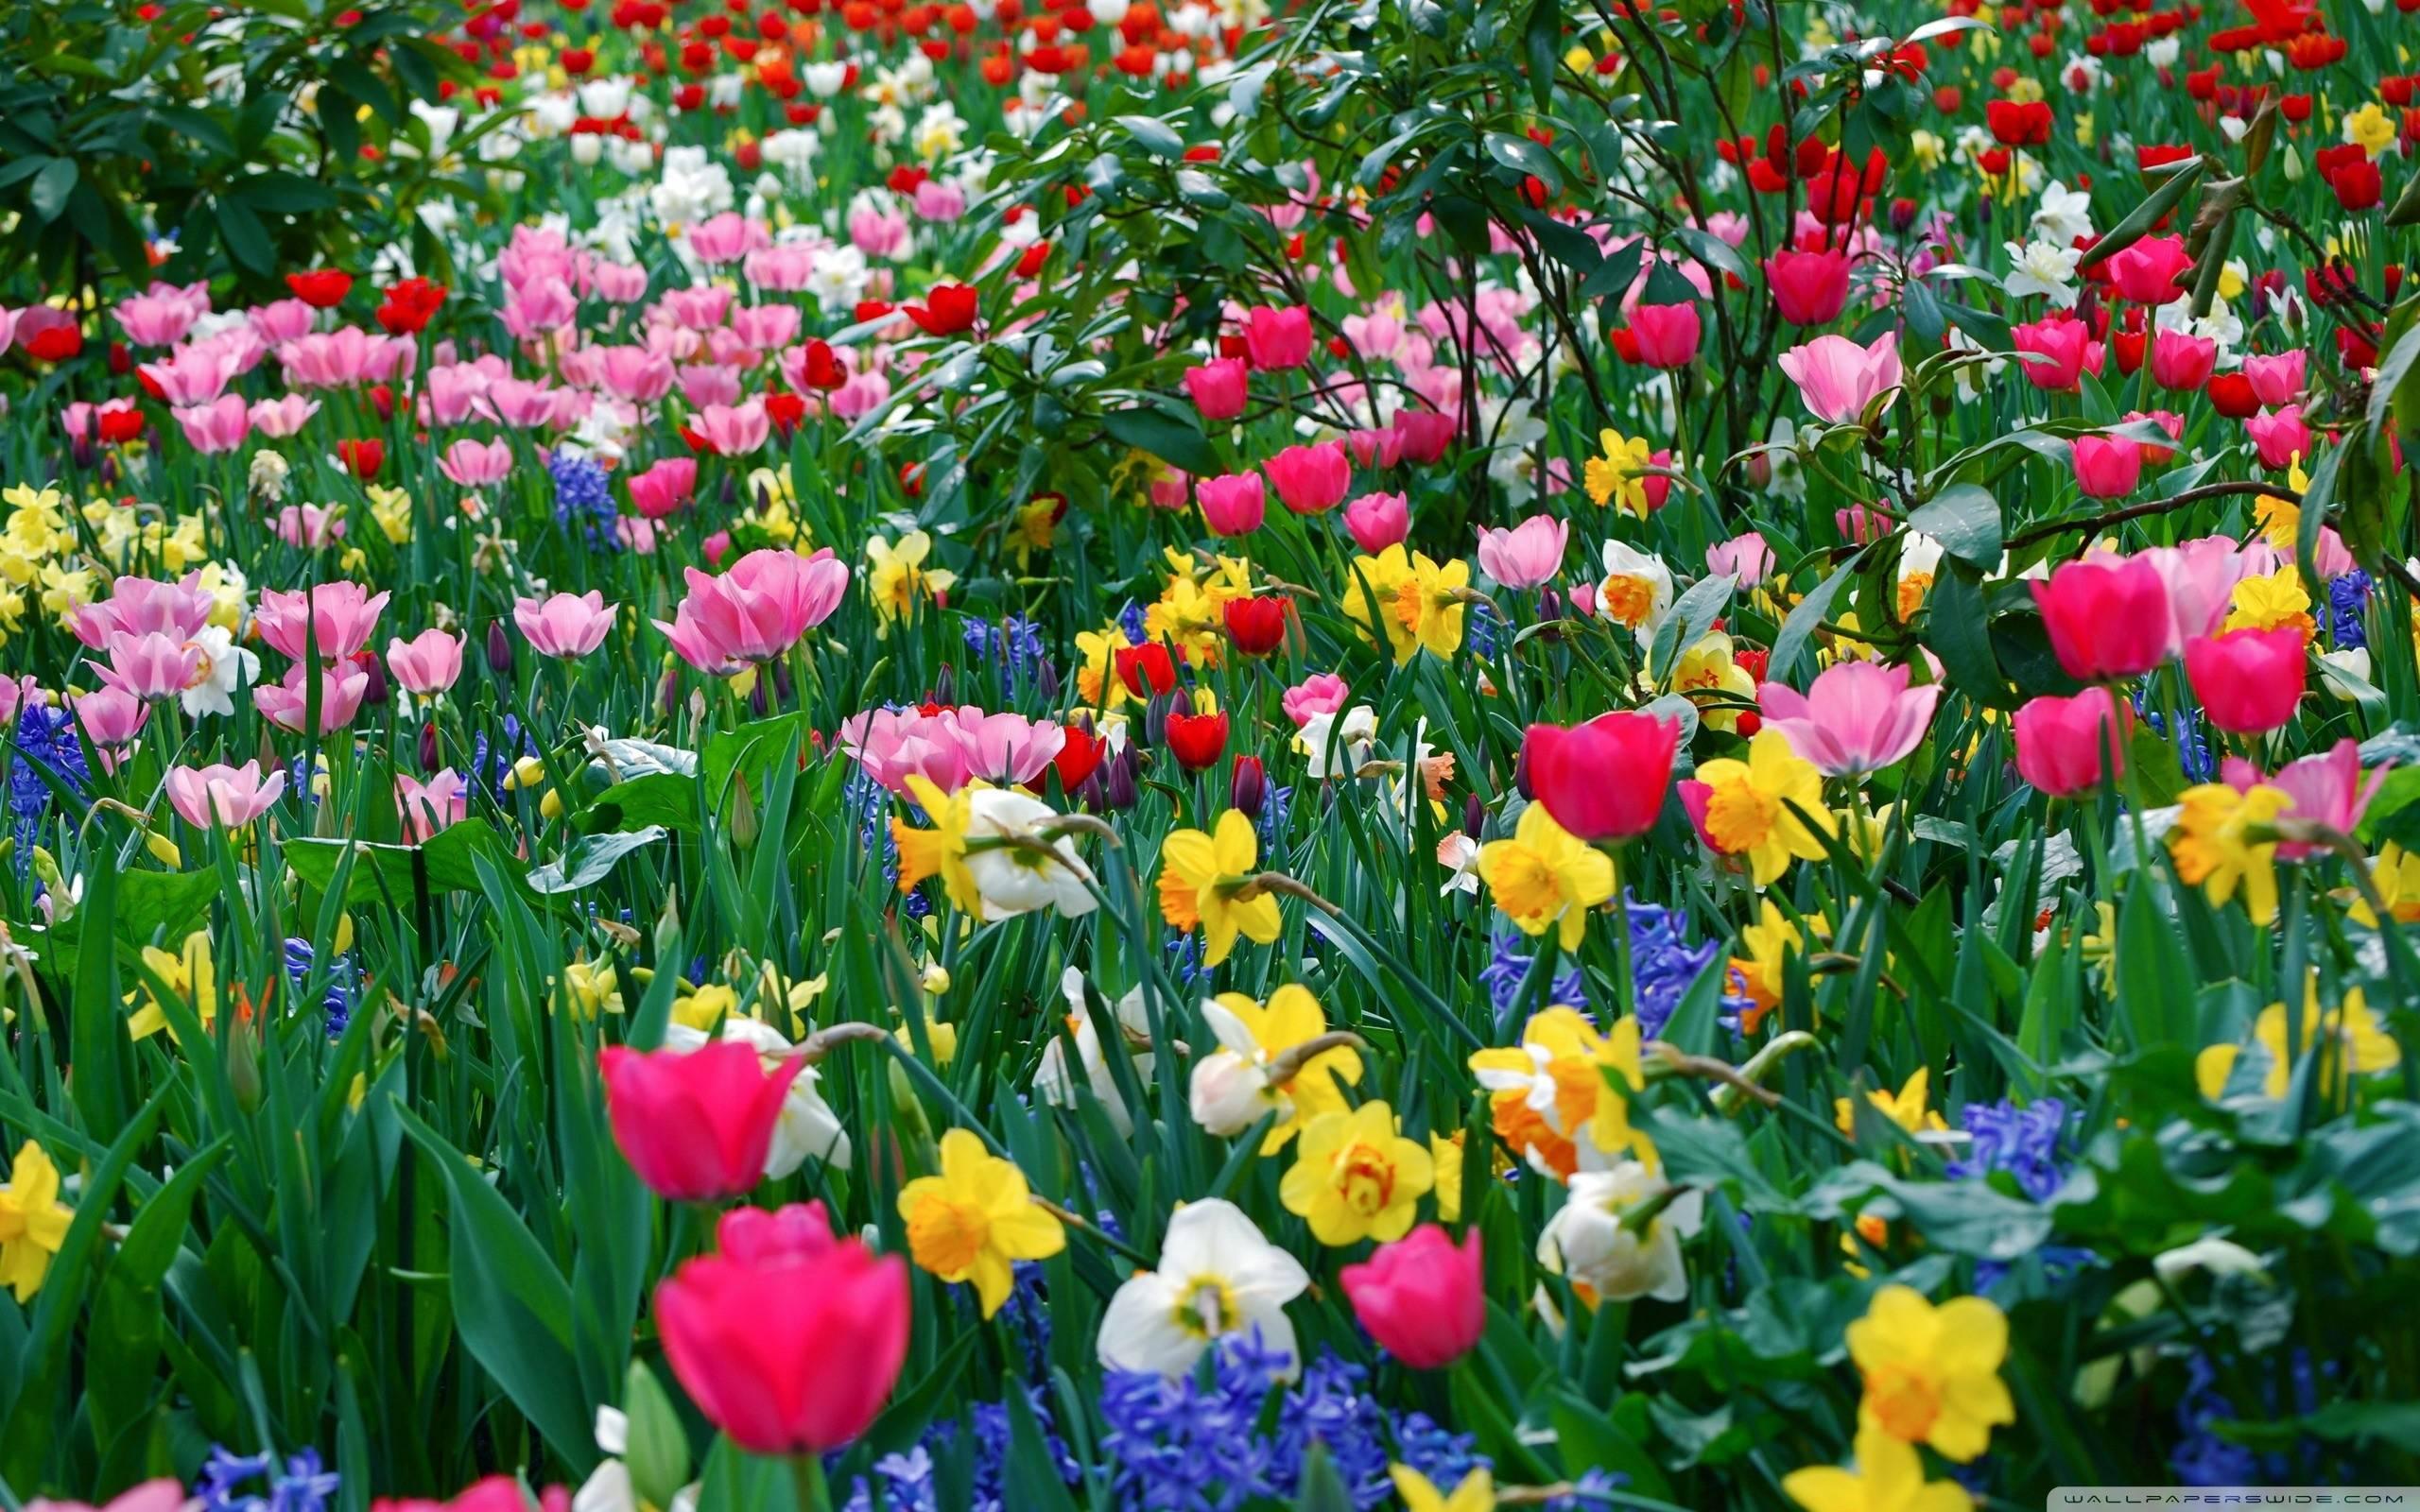 download Desktop Wallpapers Spring Flowers [2560x1600] for 2560x1600